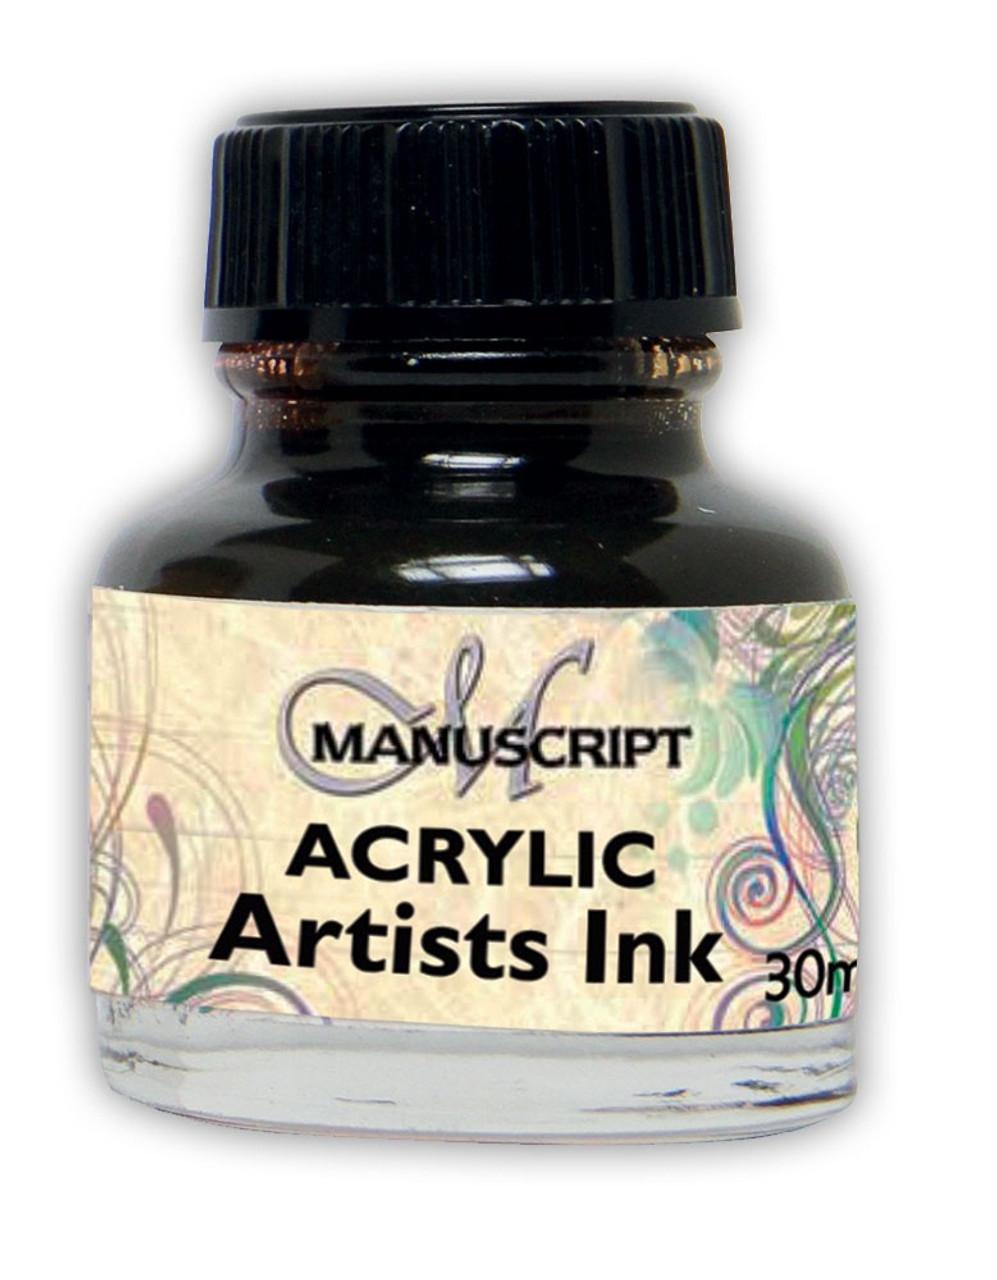 Manuscript 30ml Sepia Artists Acrylic Ink Bottle